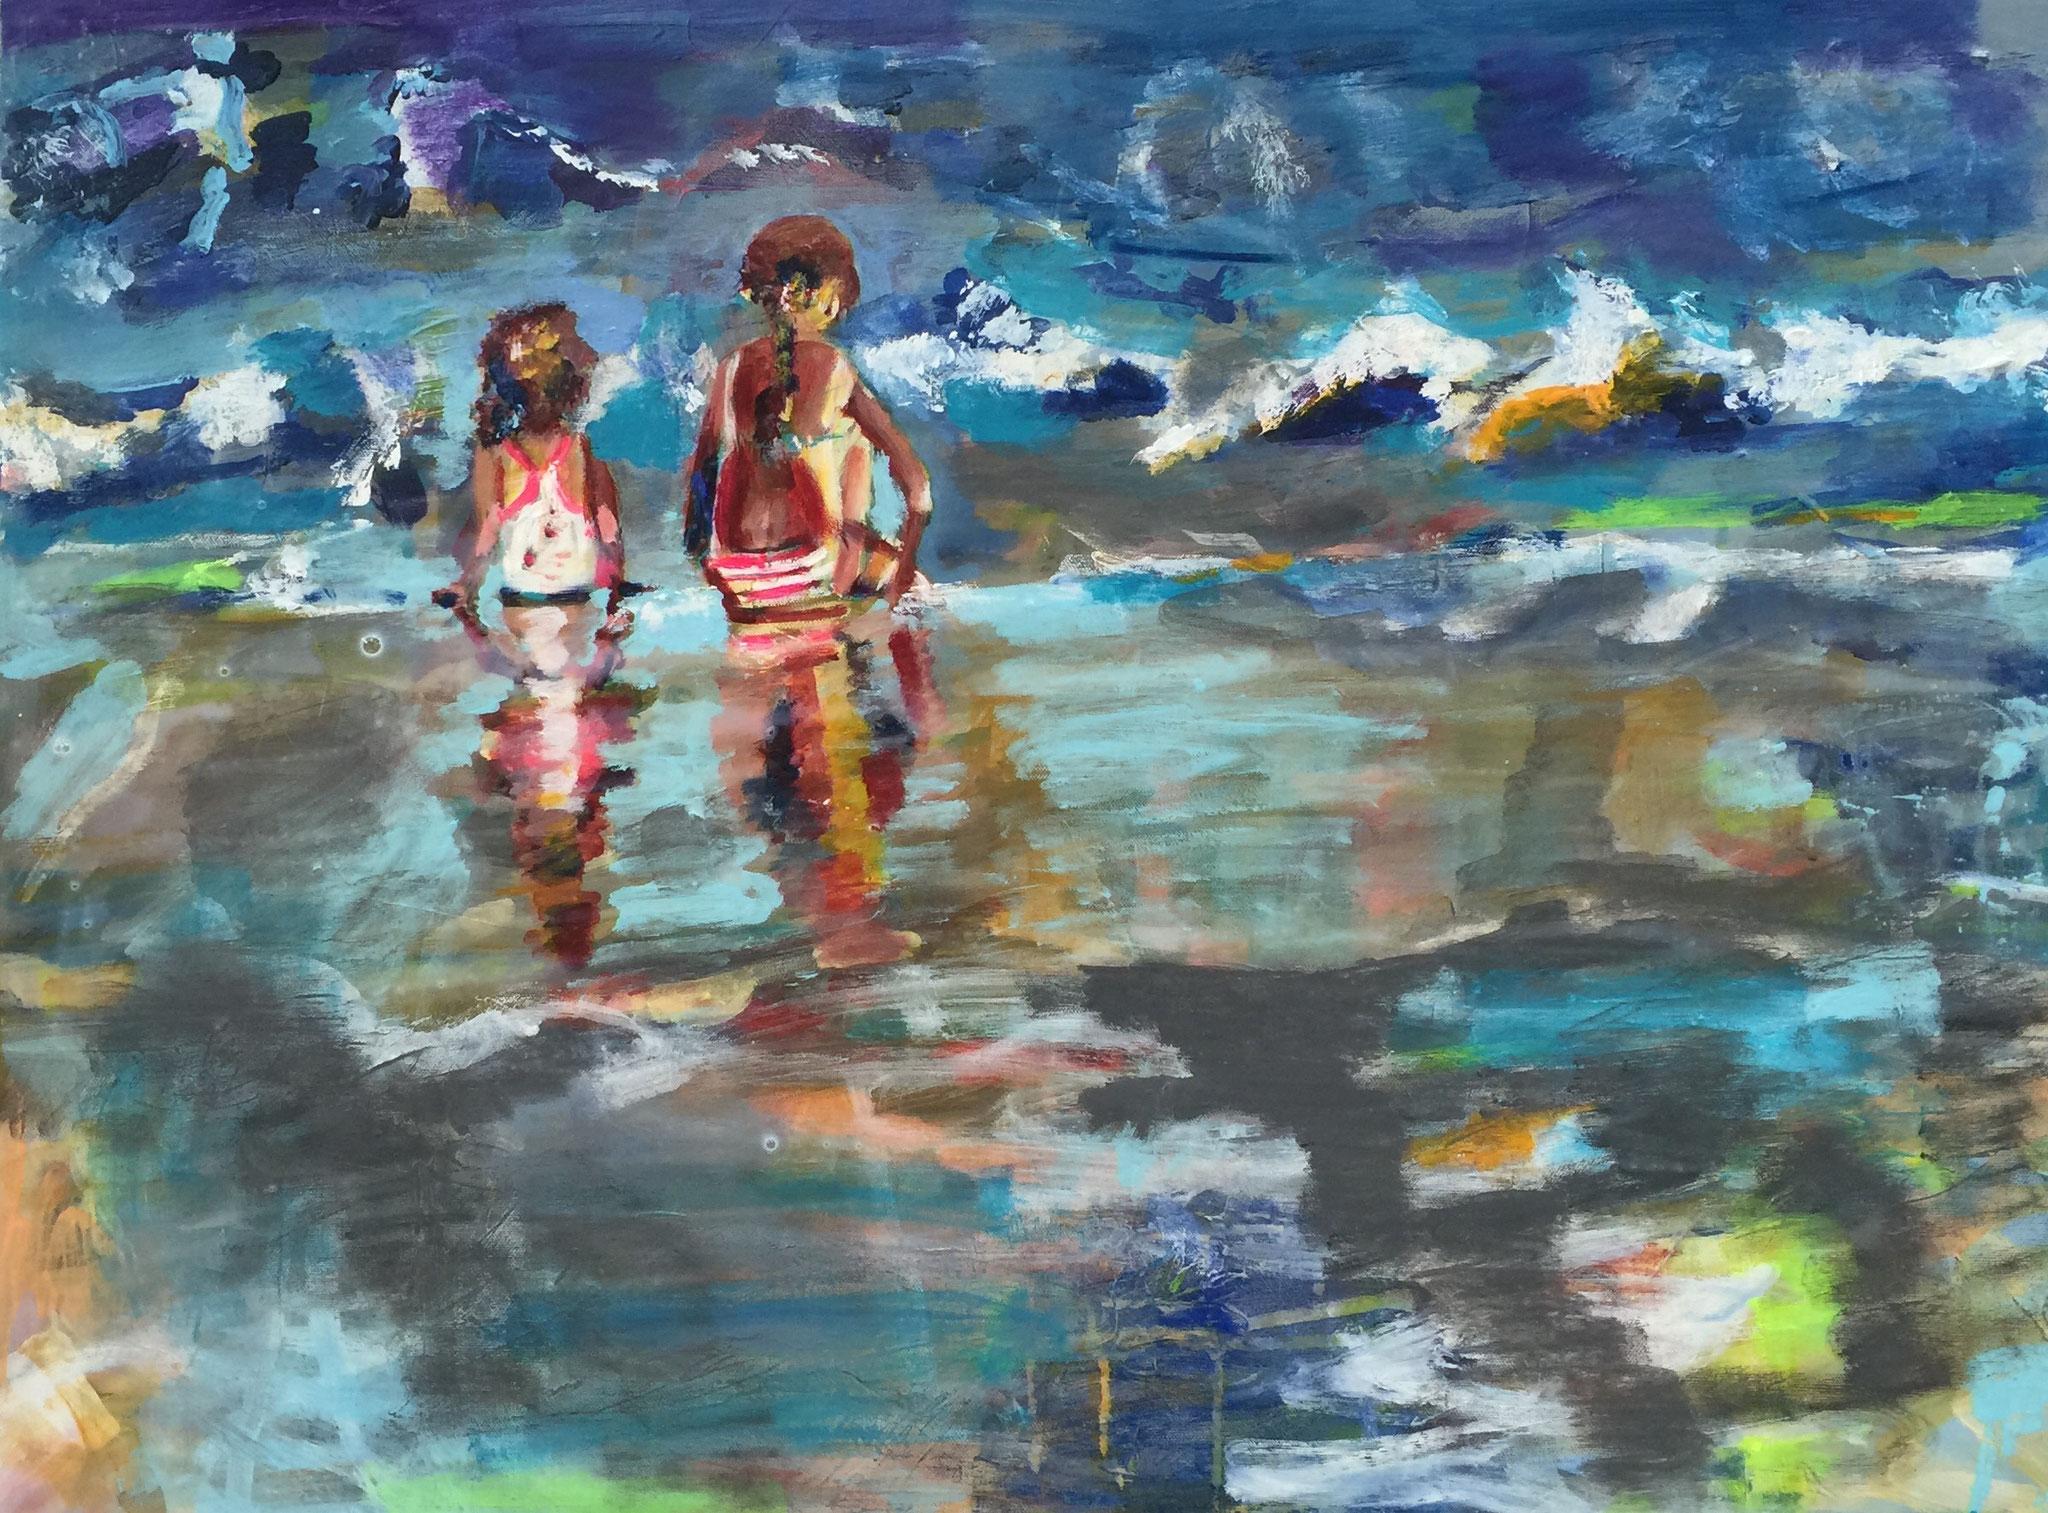 Wasser 6, 60x80  acrylic on canvas